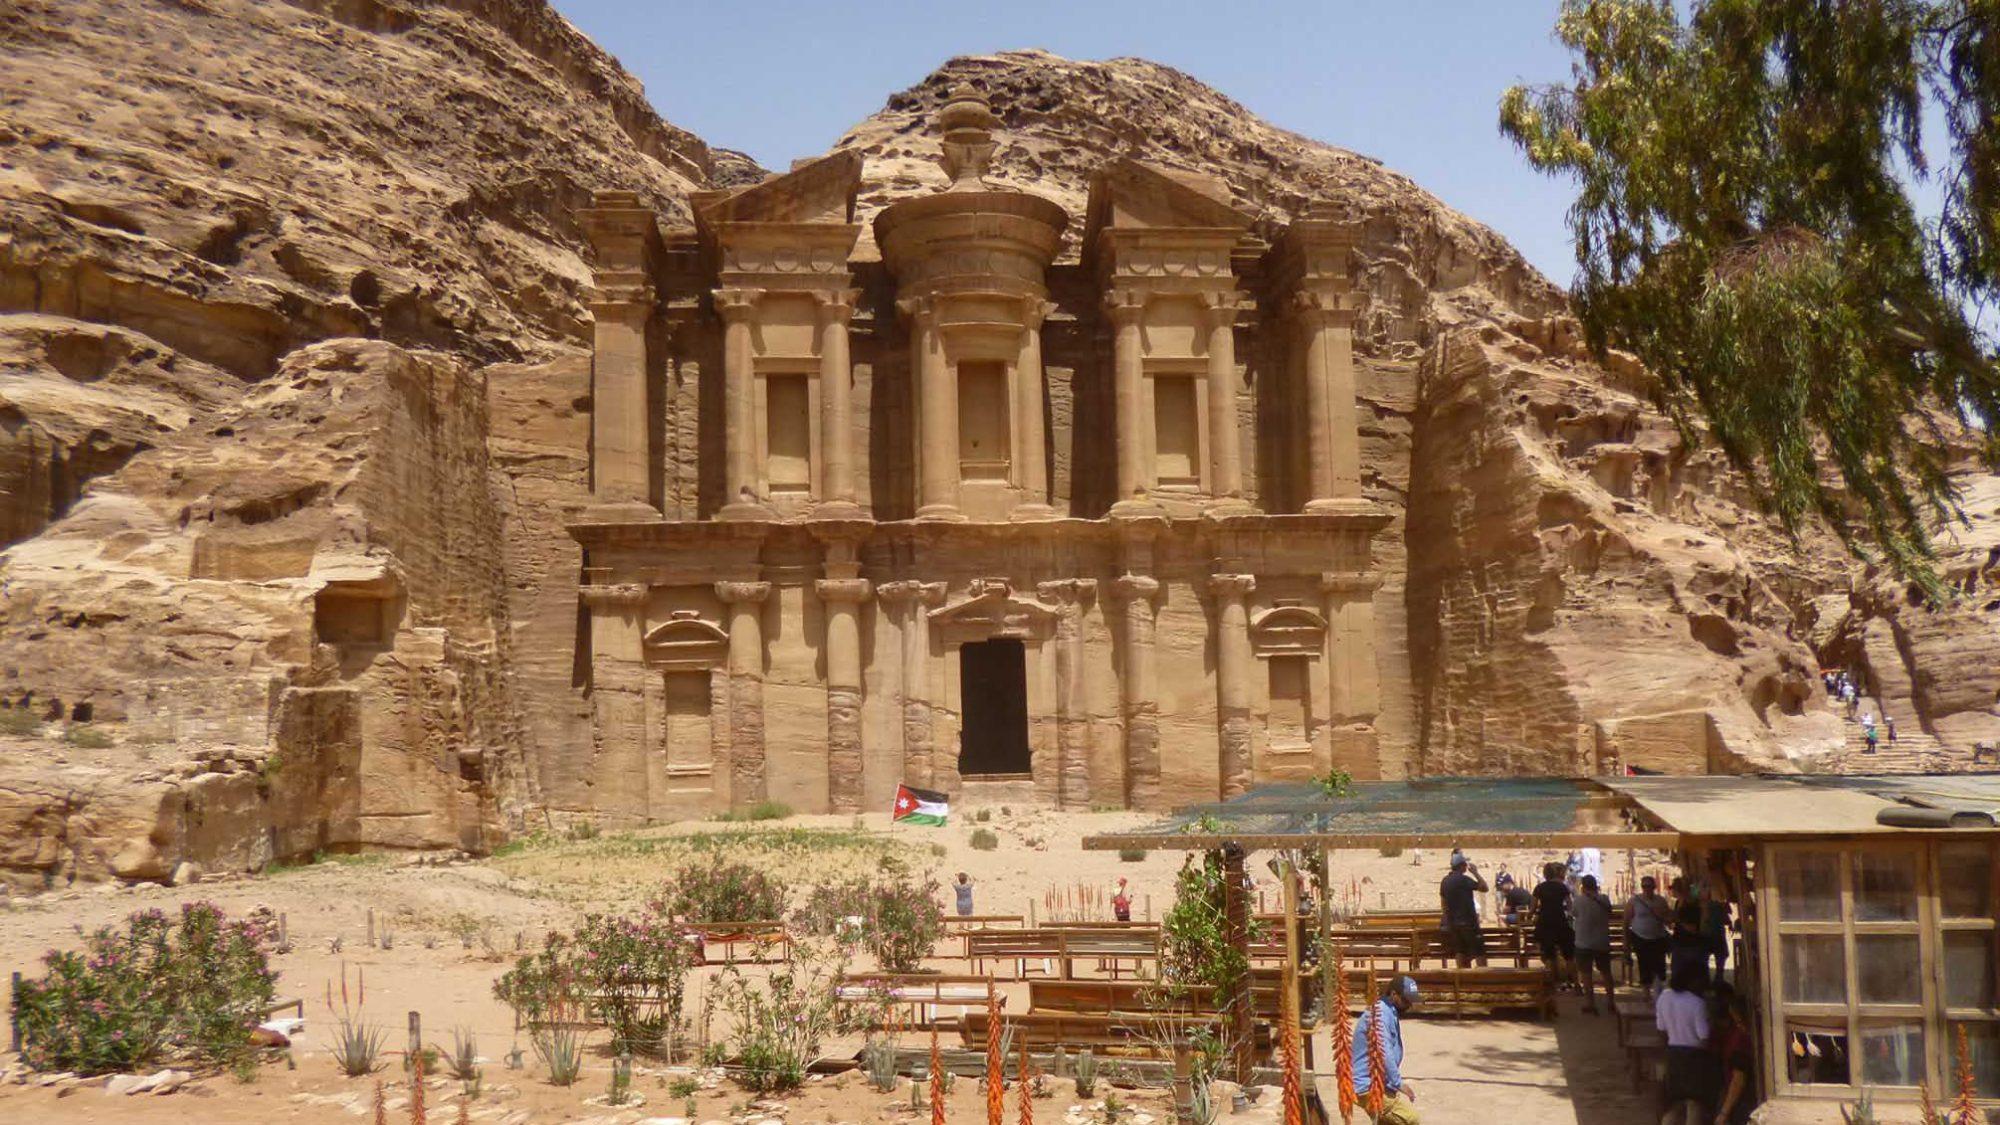 Kloster Ad Deir